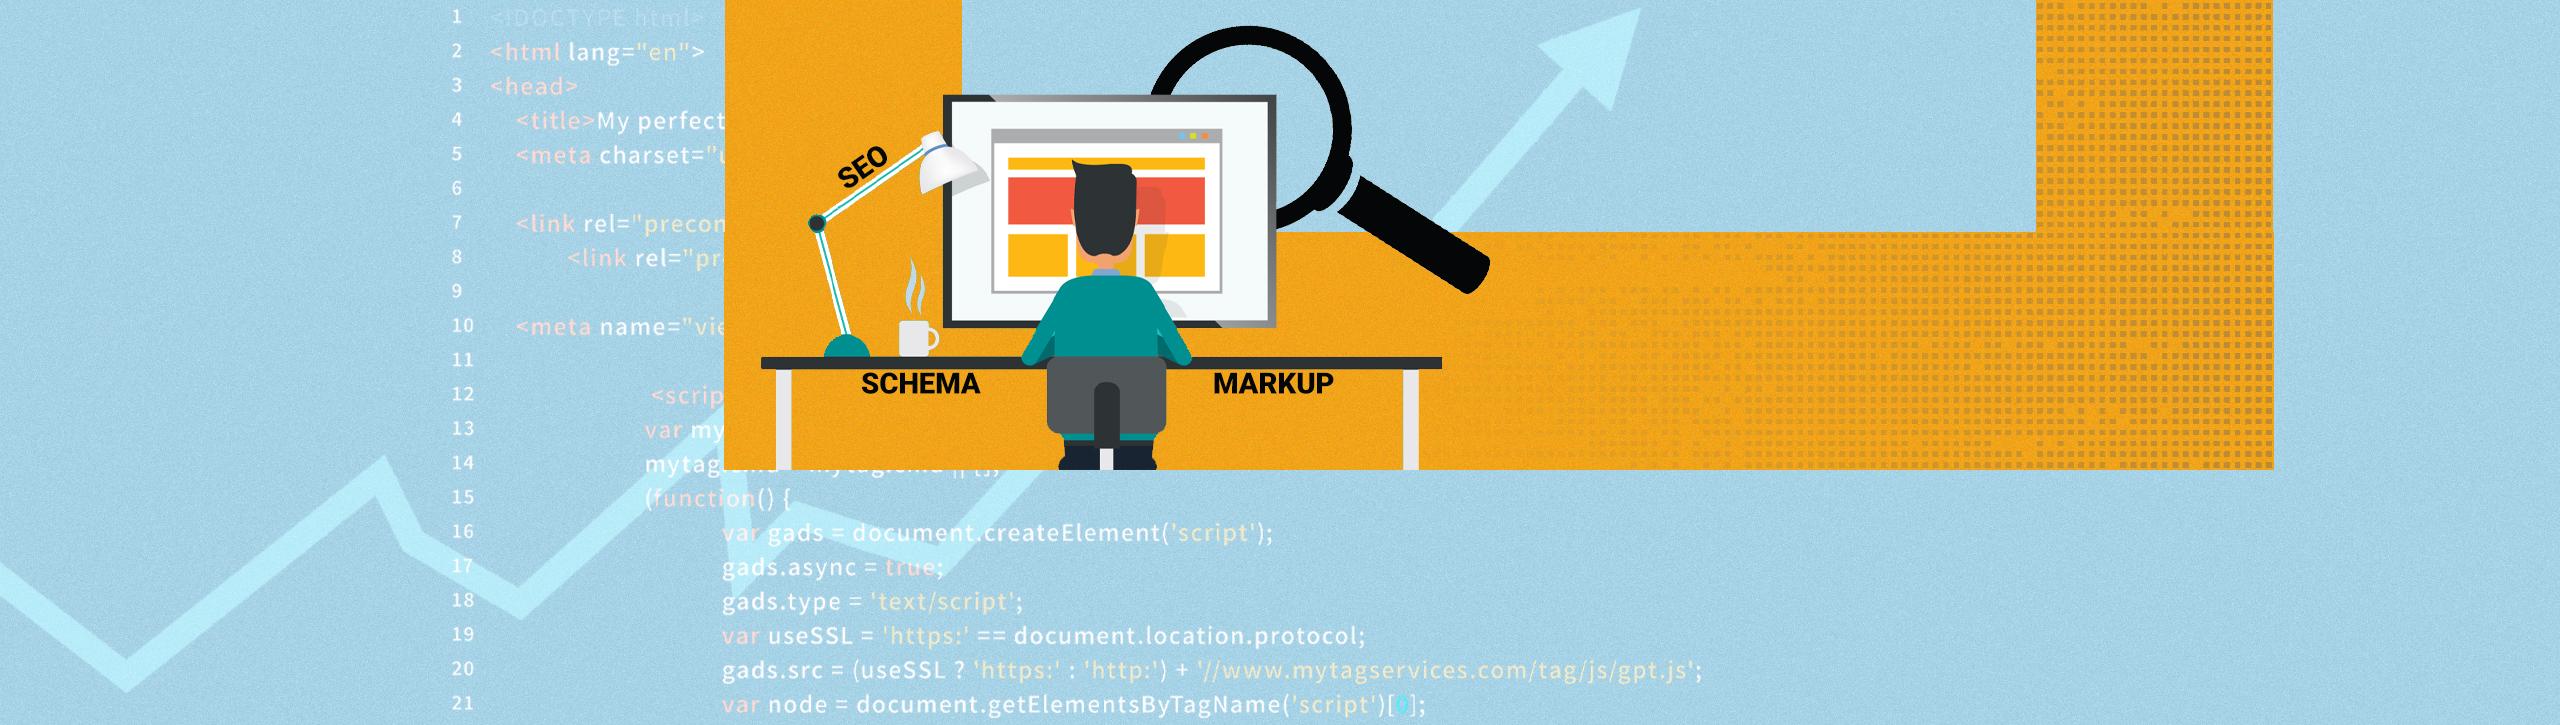 Schema Markup for Dummies: An MRS Guide 2021